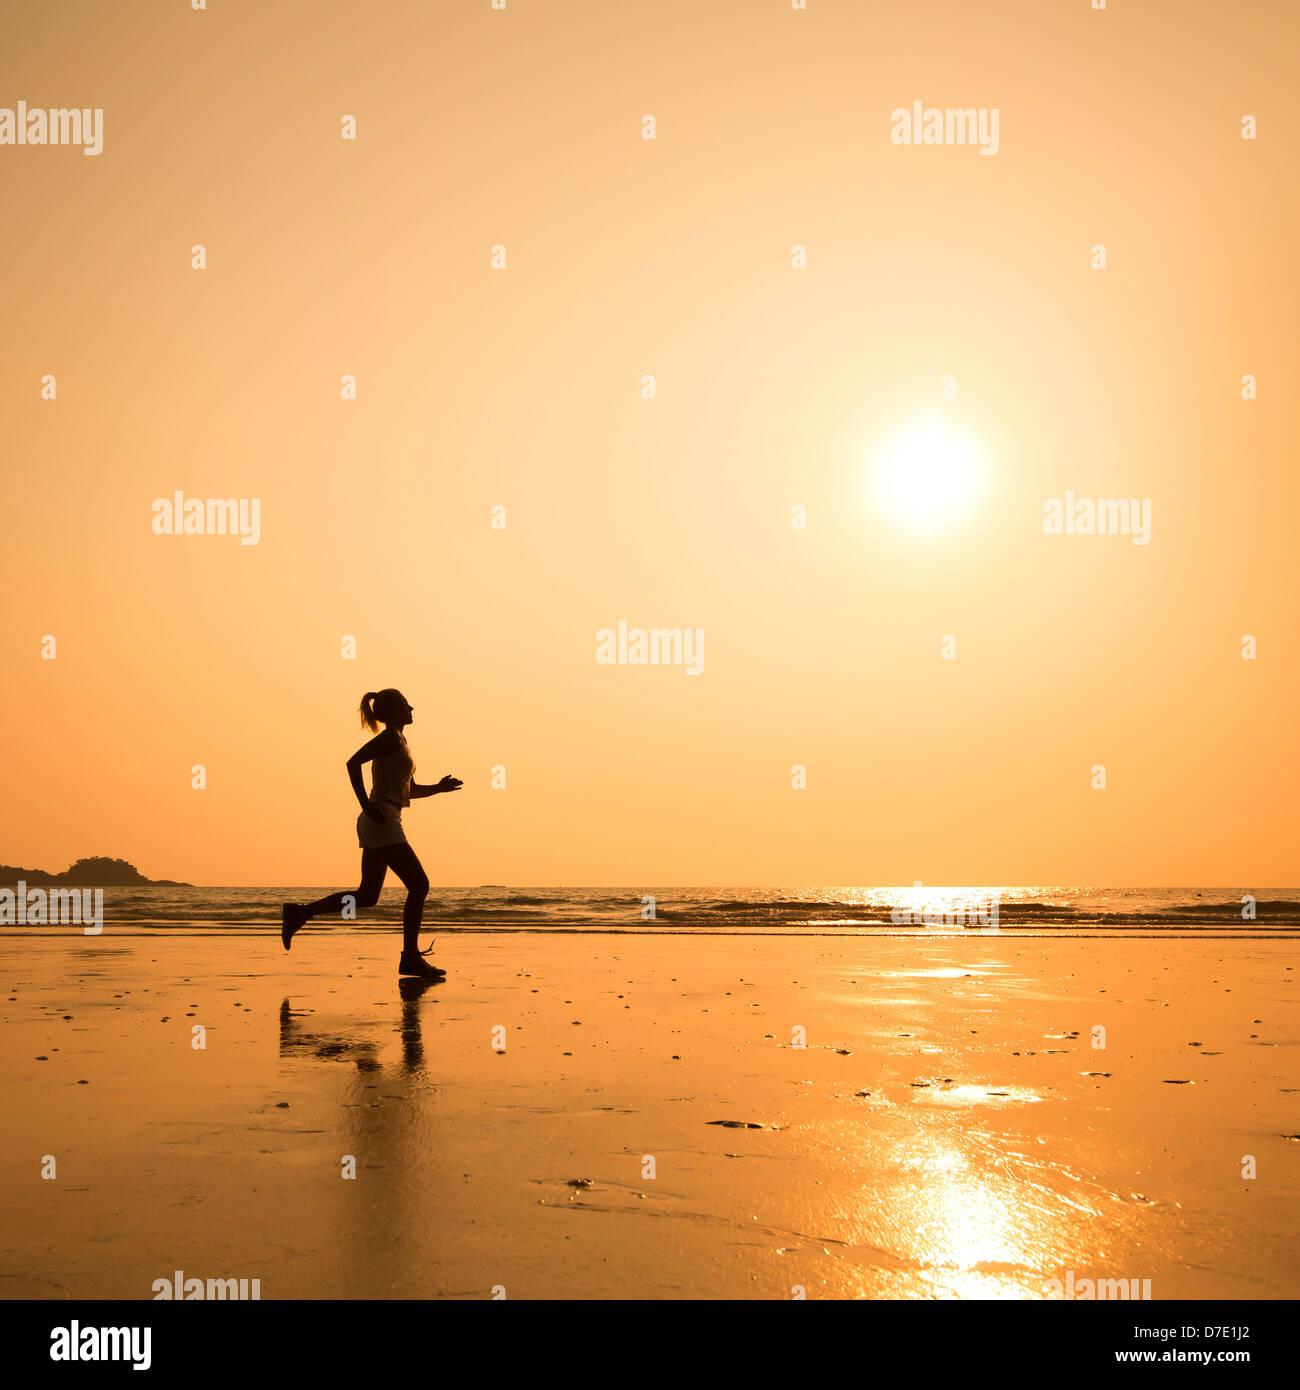 run to purpose, woman silhouette on the beach - Stock Image